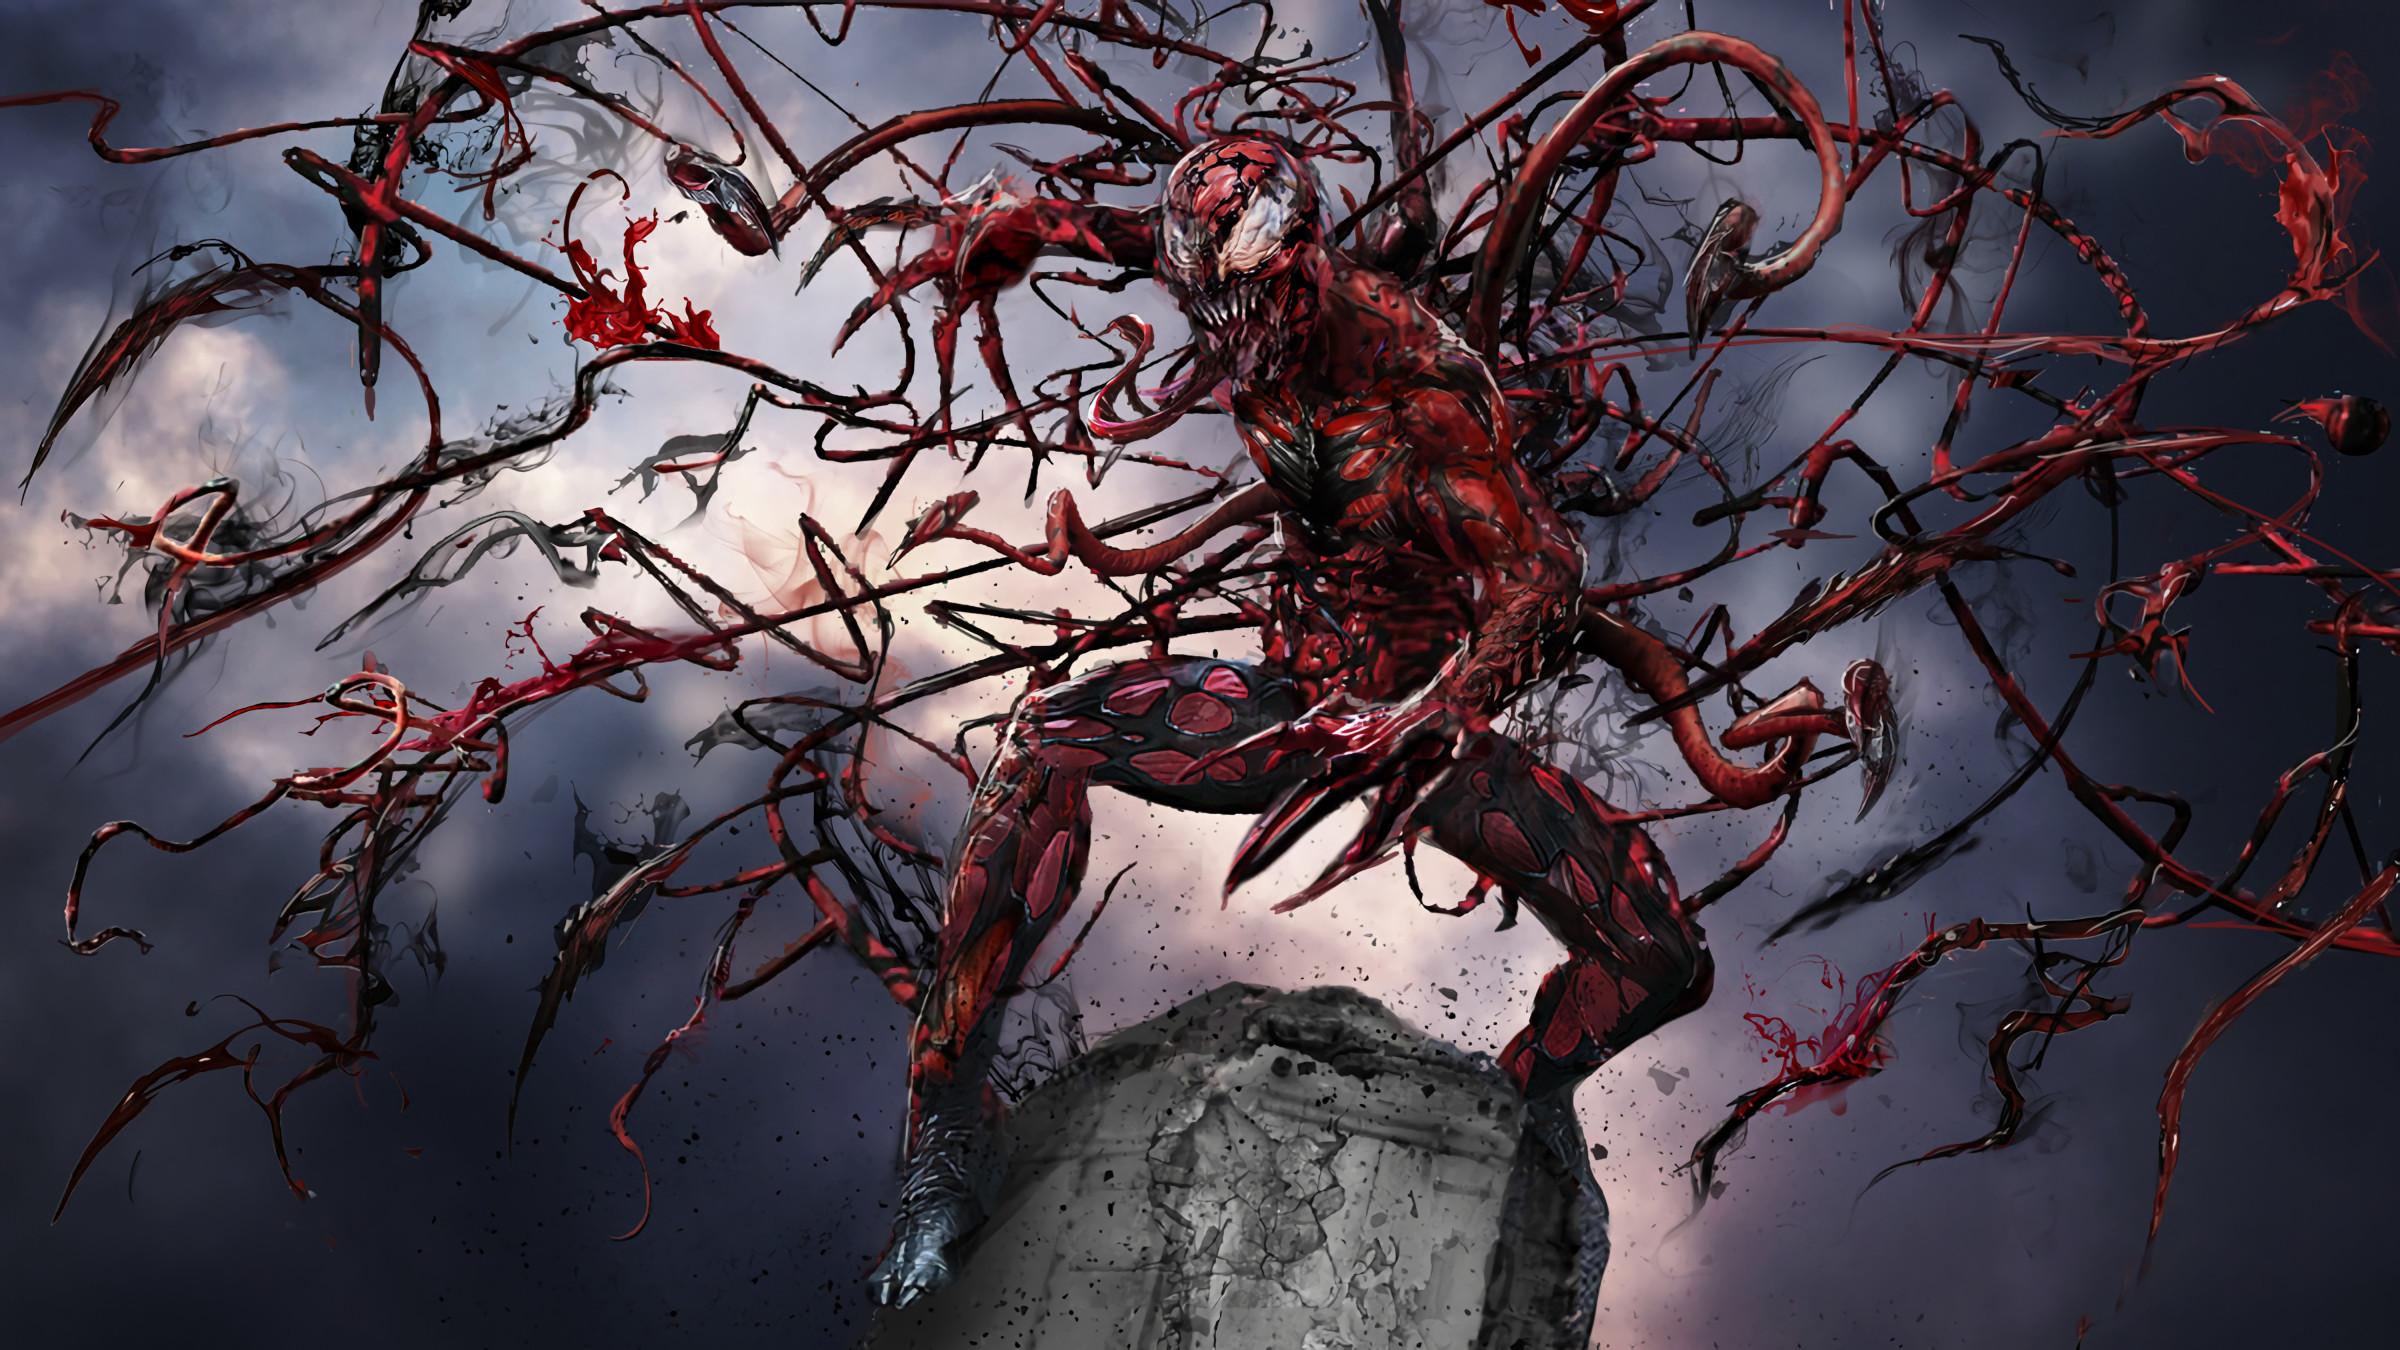 Comics – Carnage Marvel Comics Carnage (Marvel) Wallpaper